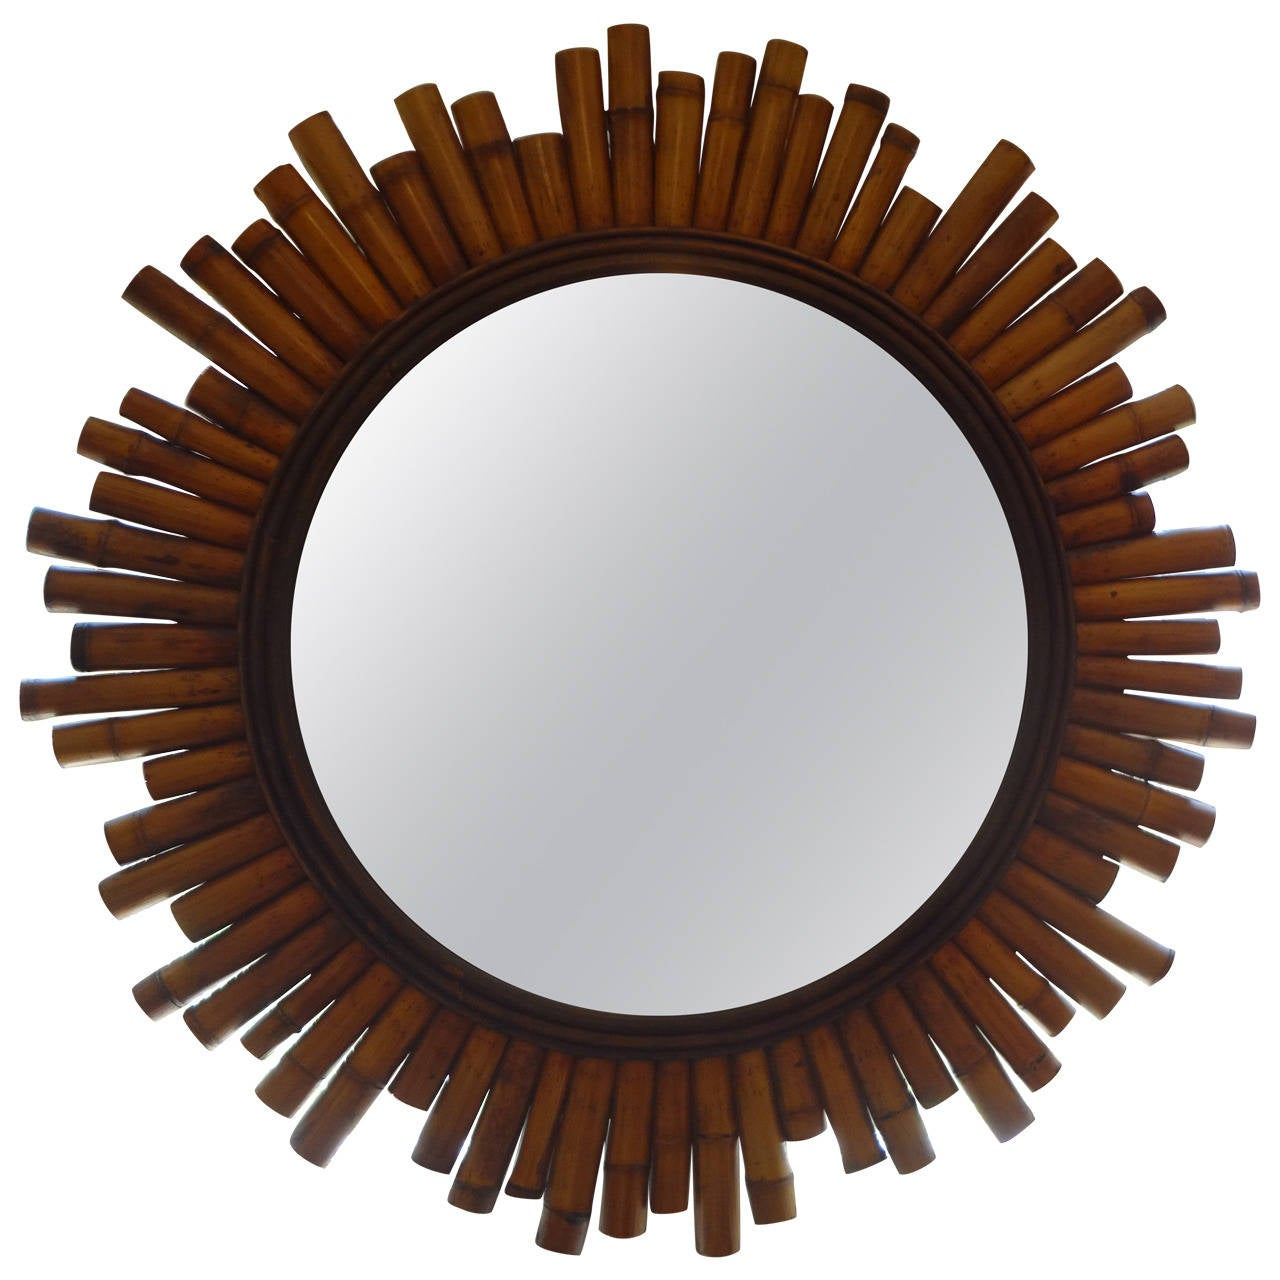 Mid century modern split bamboo sunburst mirror for sale for Sunburst mirror